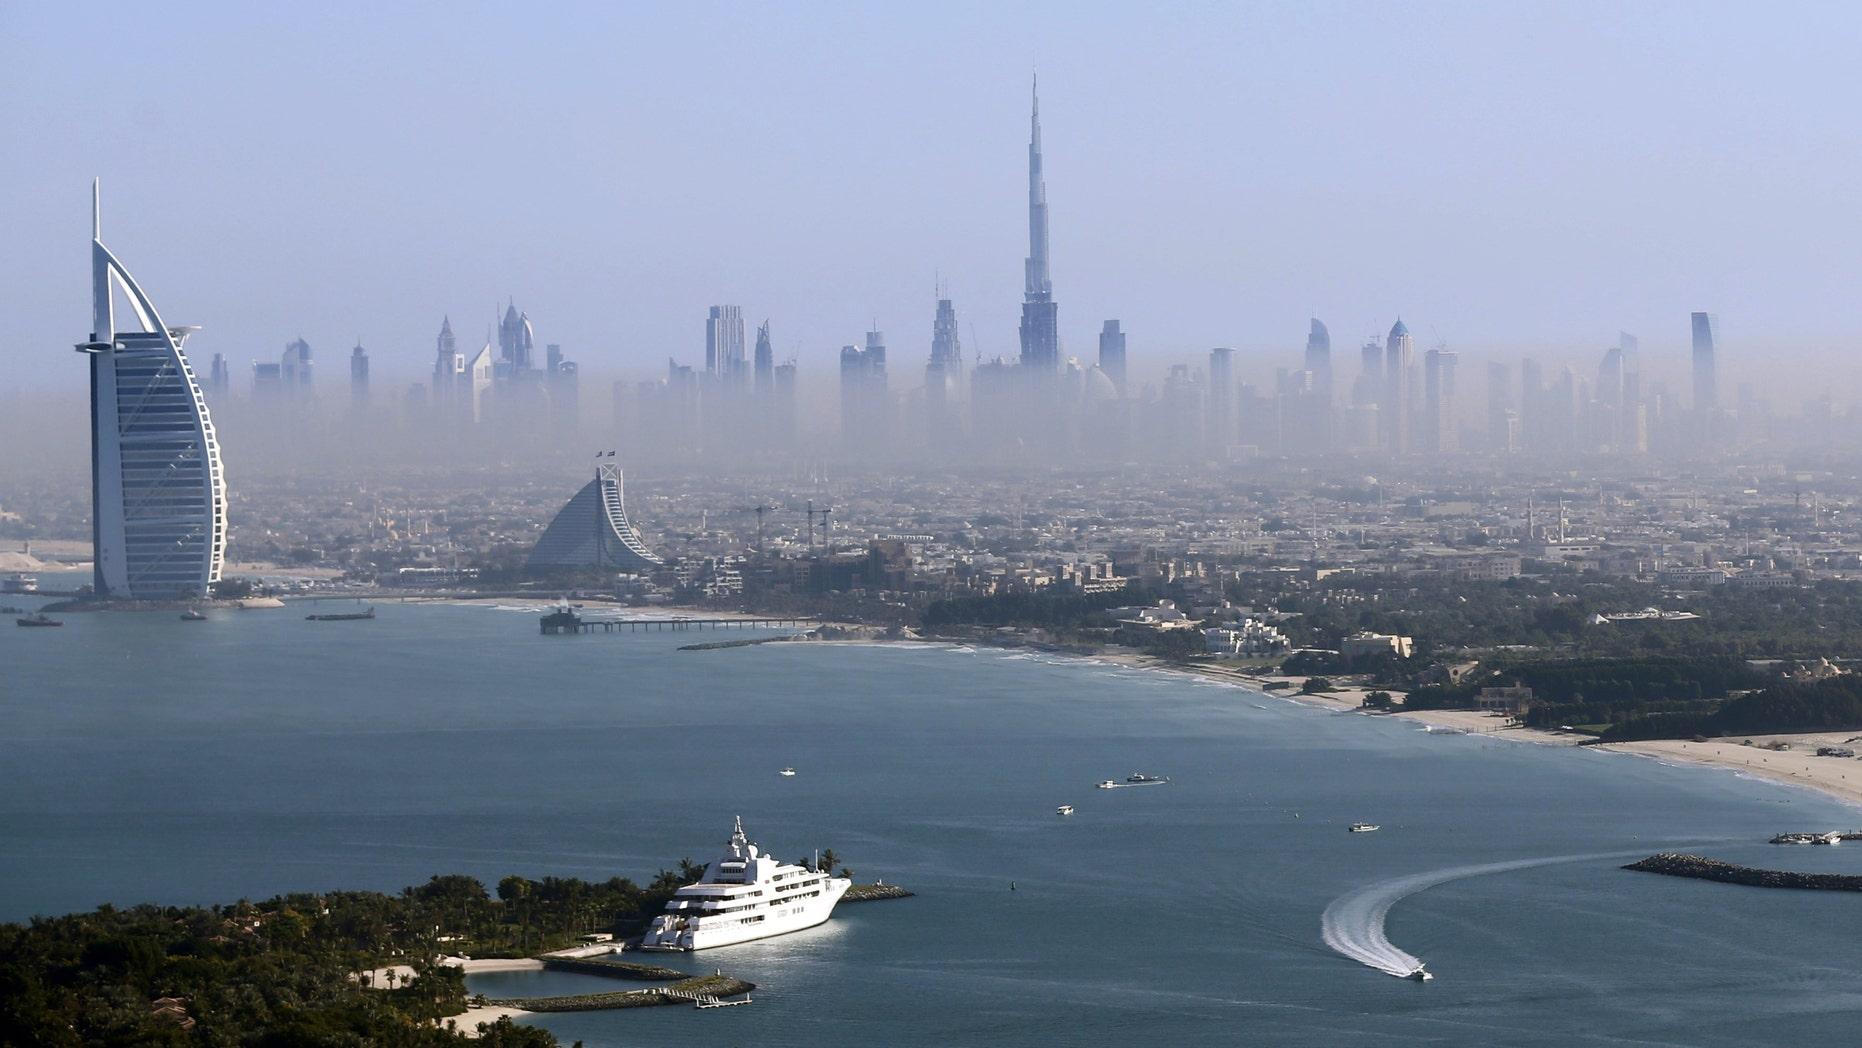 File photo - Burj Khalifa, the world's tallest tower, and luxury Burj al-Arab Hotel (L) are seen in a general view of Dubai, UAE December 9, 2015. (REUTERS/Karim Sahib/Pool)